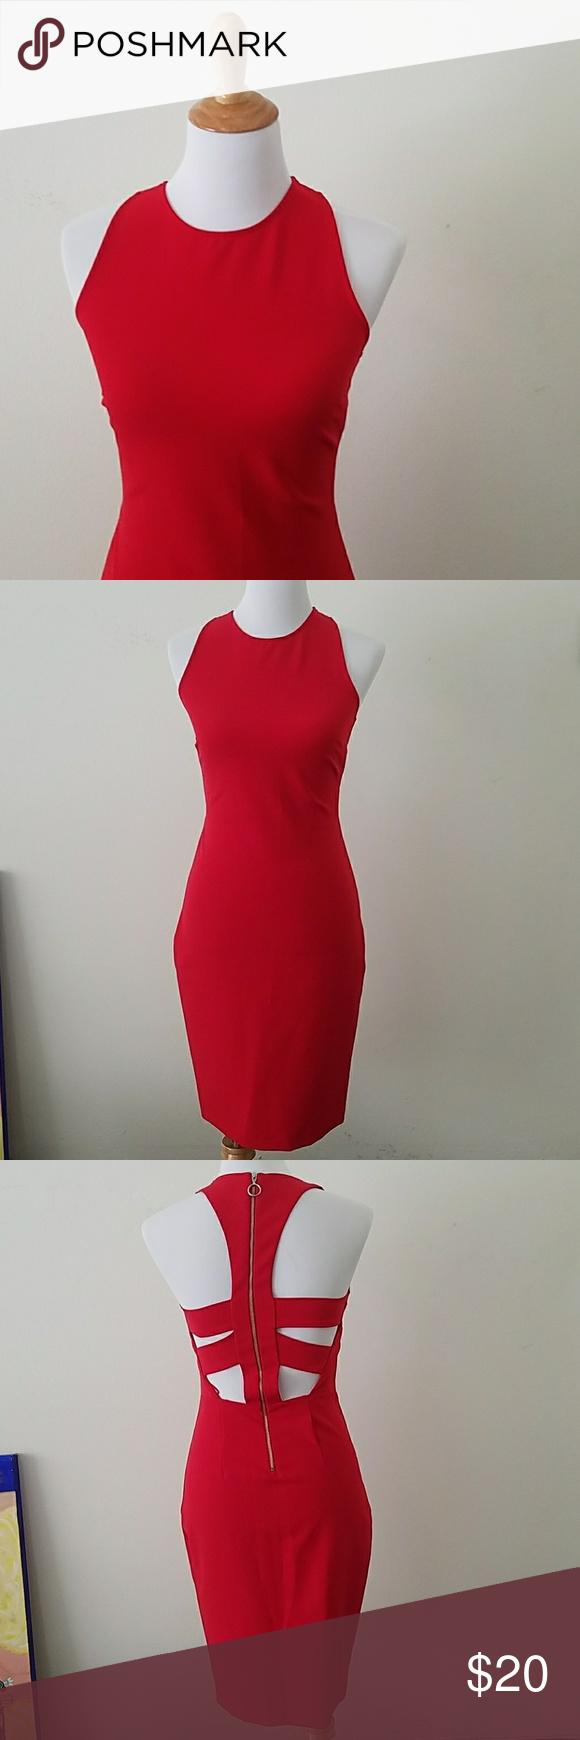 Zara red dress with cutouts